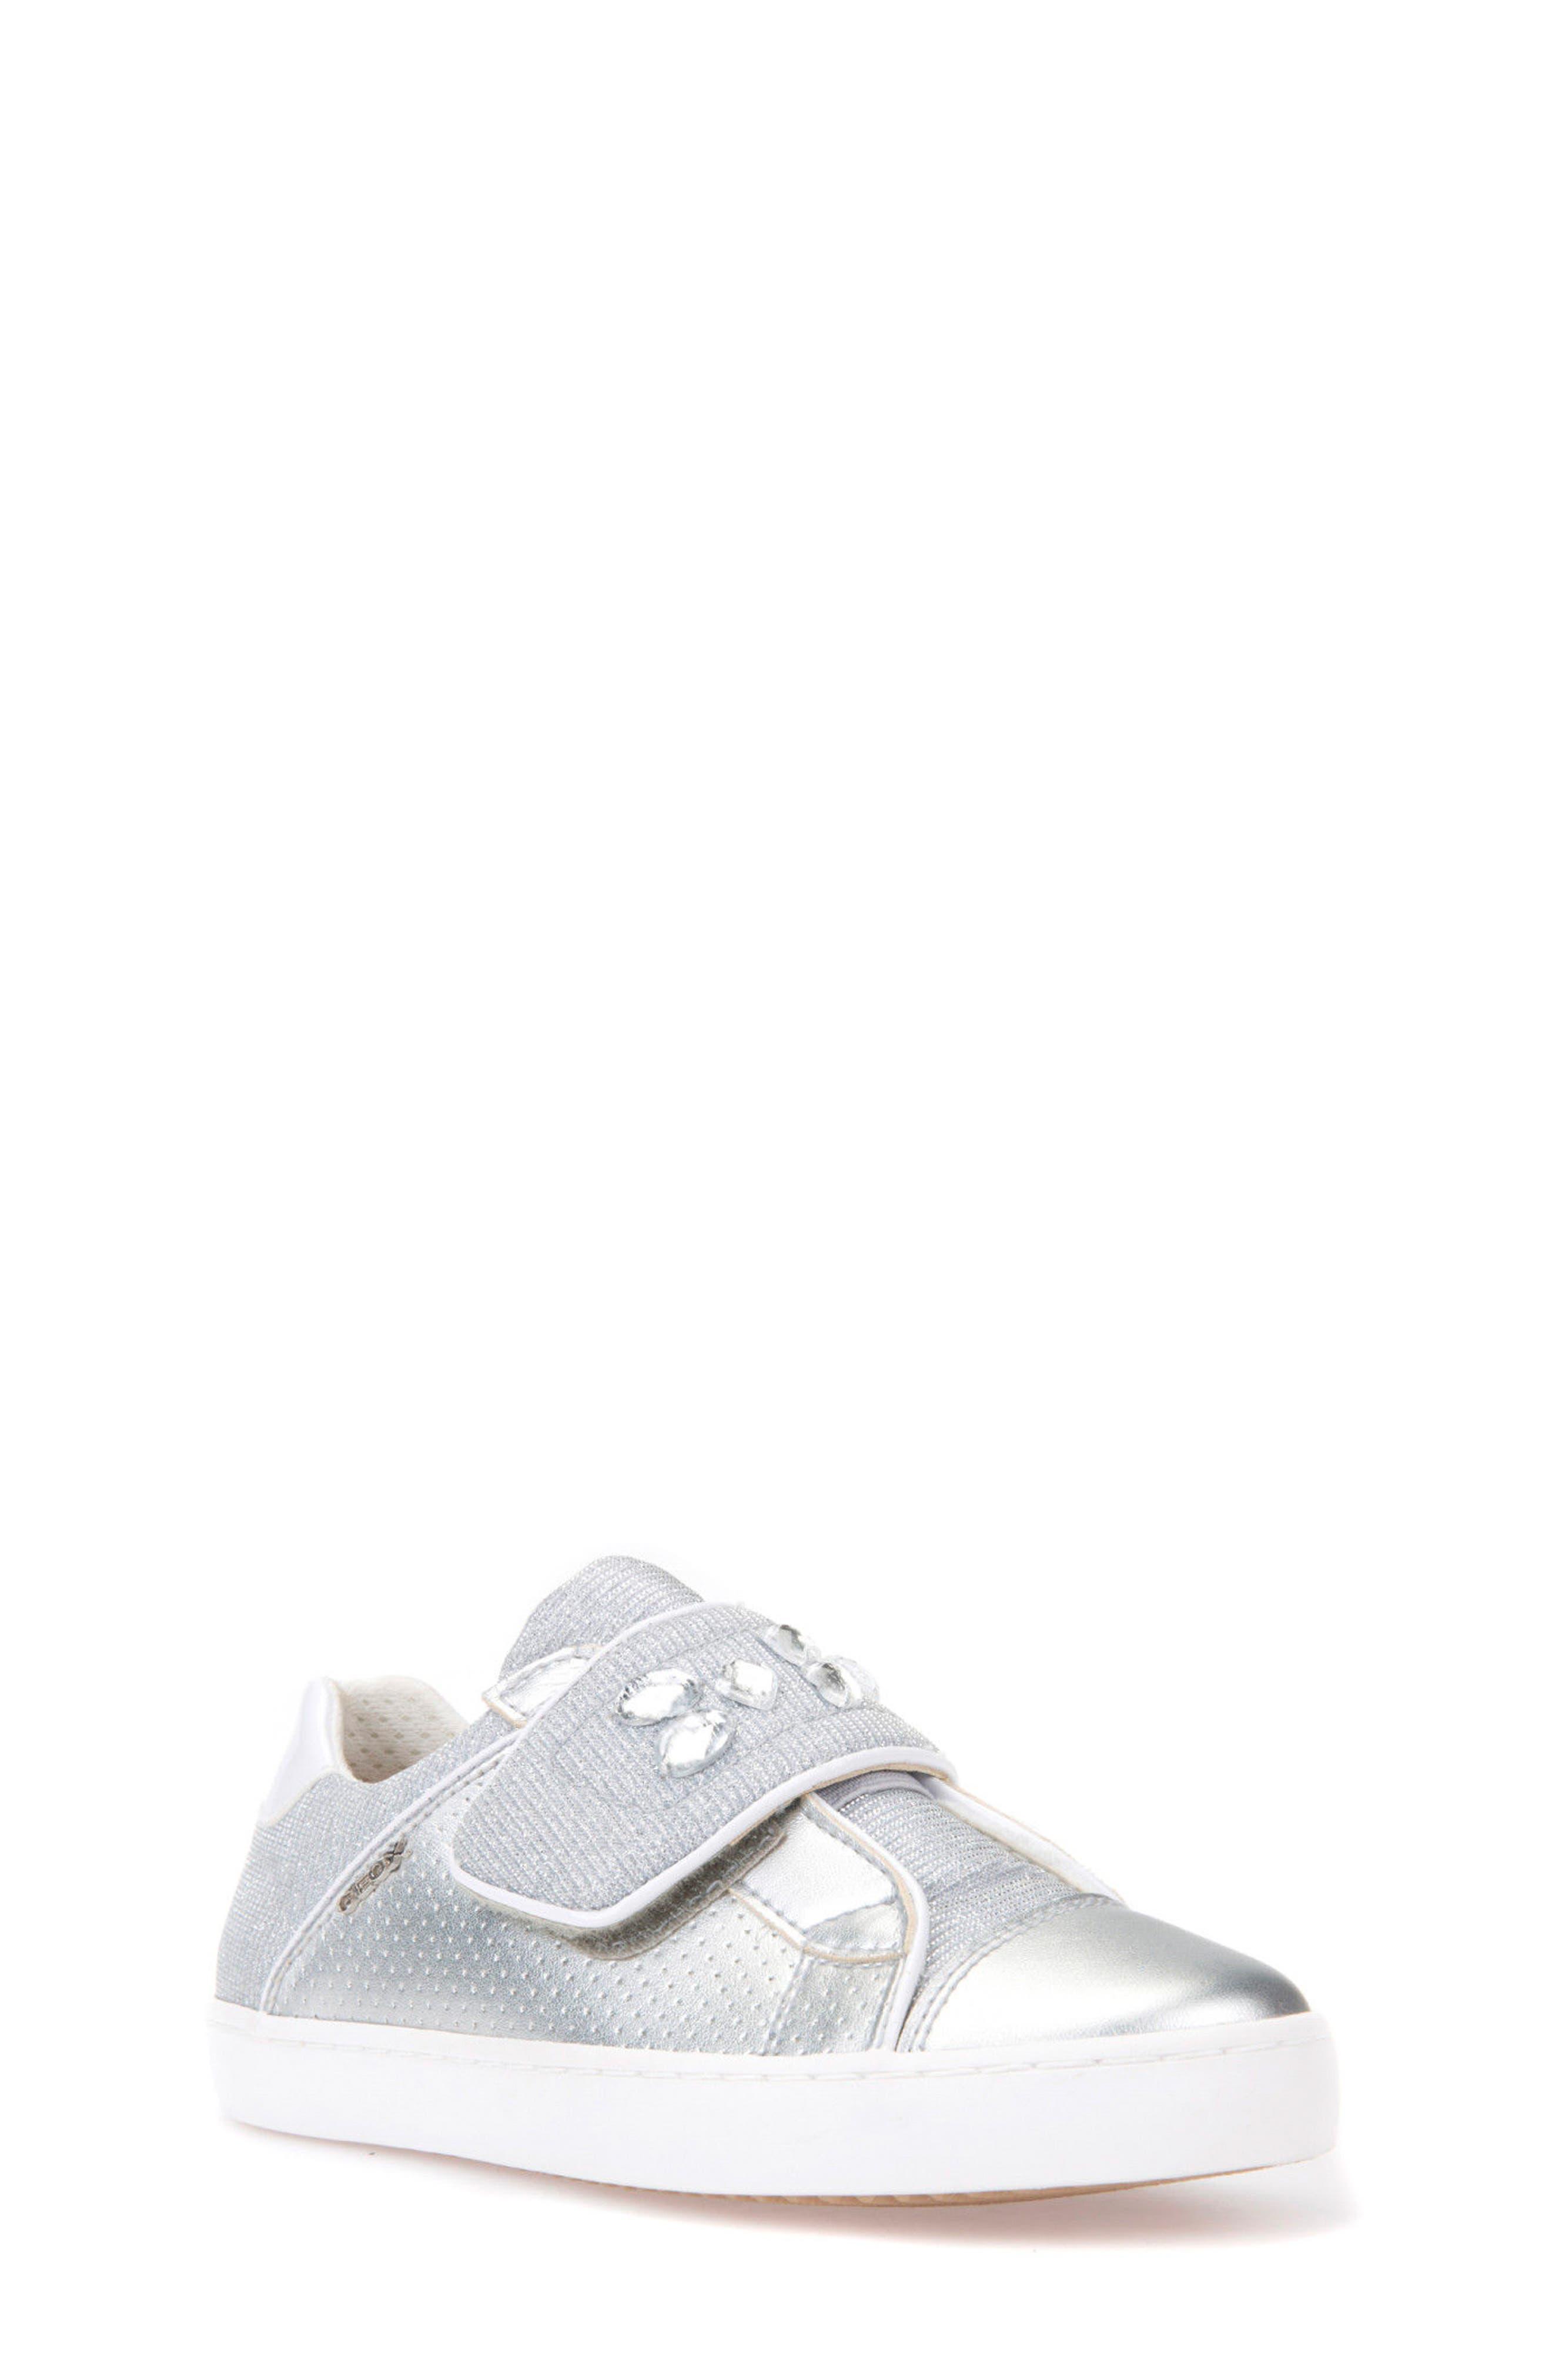 Kilwi Metallic Embellished Sneaker,                         Main,                         color, SILVER